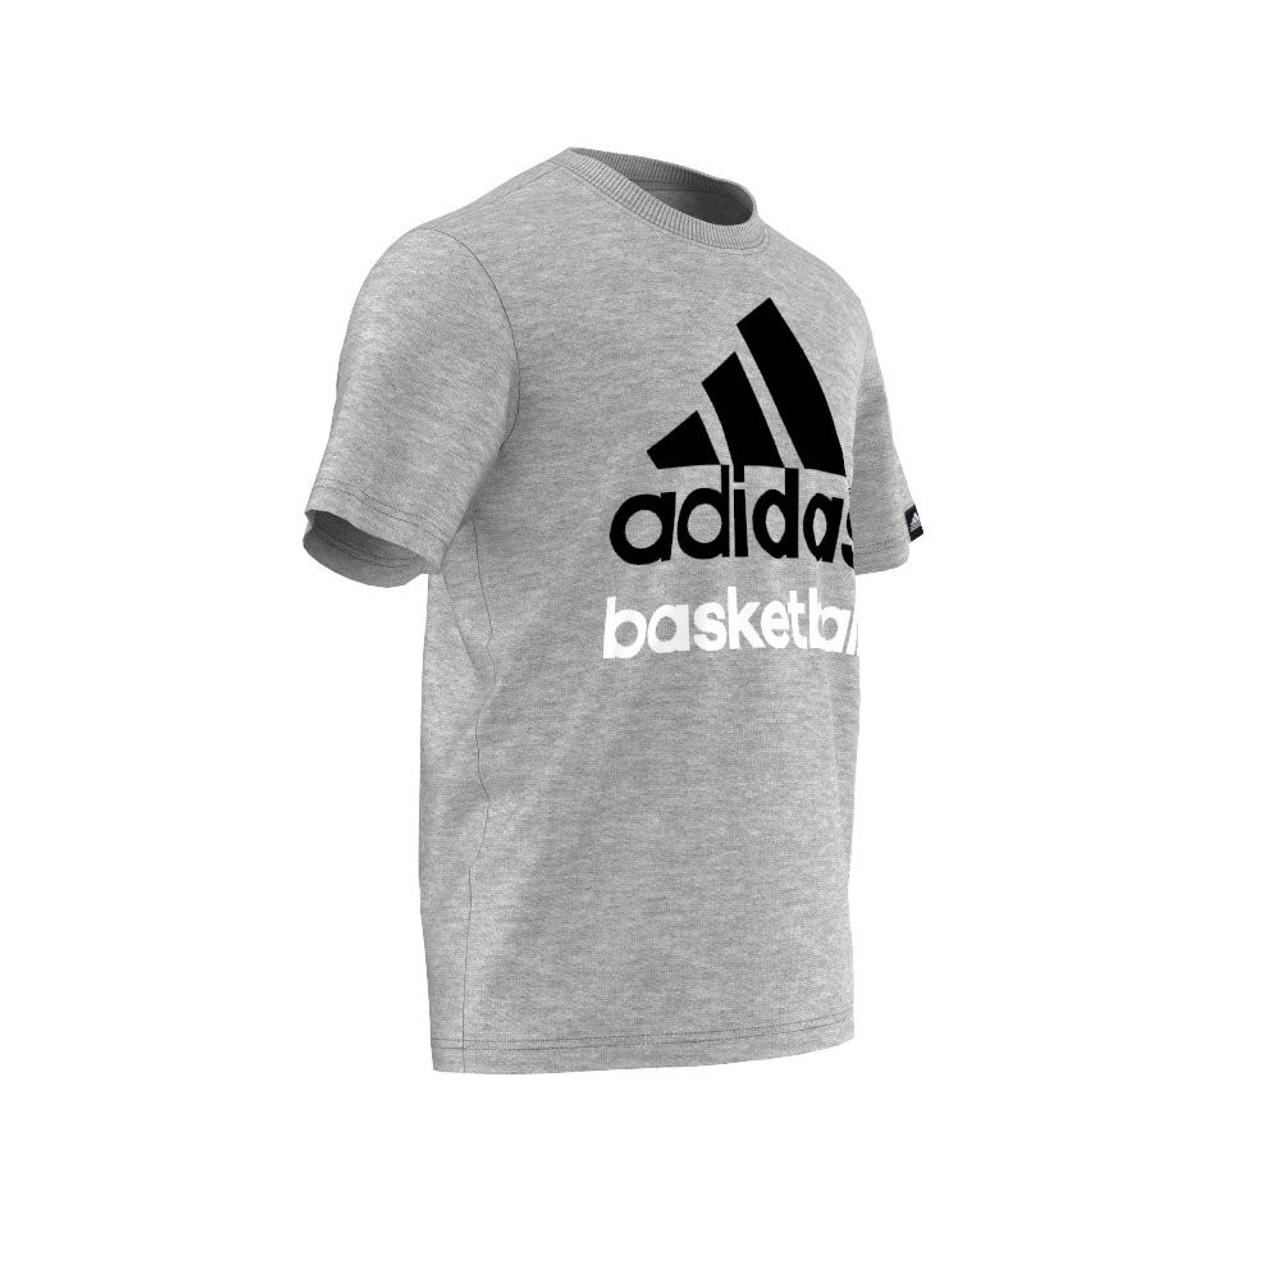 Logo Shirtgrey Adidas Adidas Basketball T 6gIyYbfv7